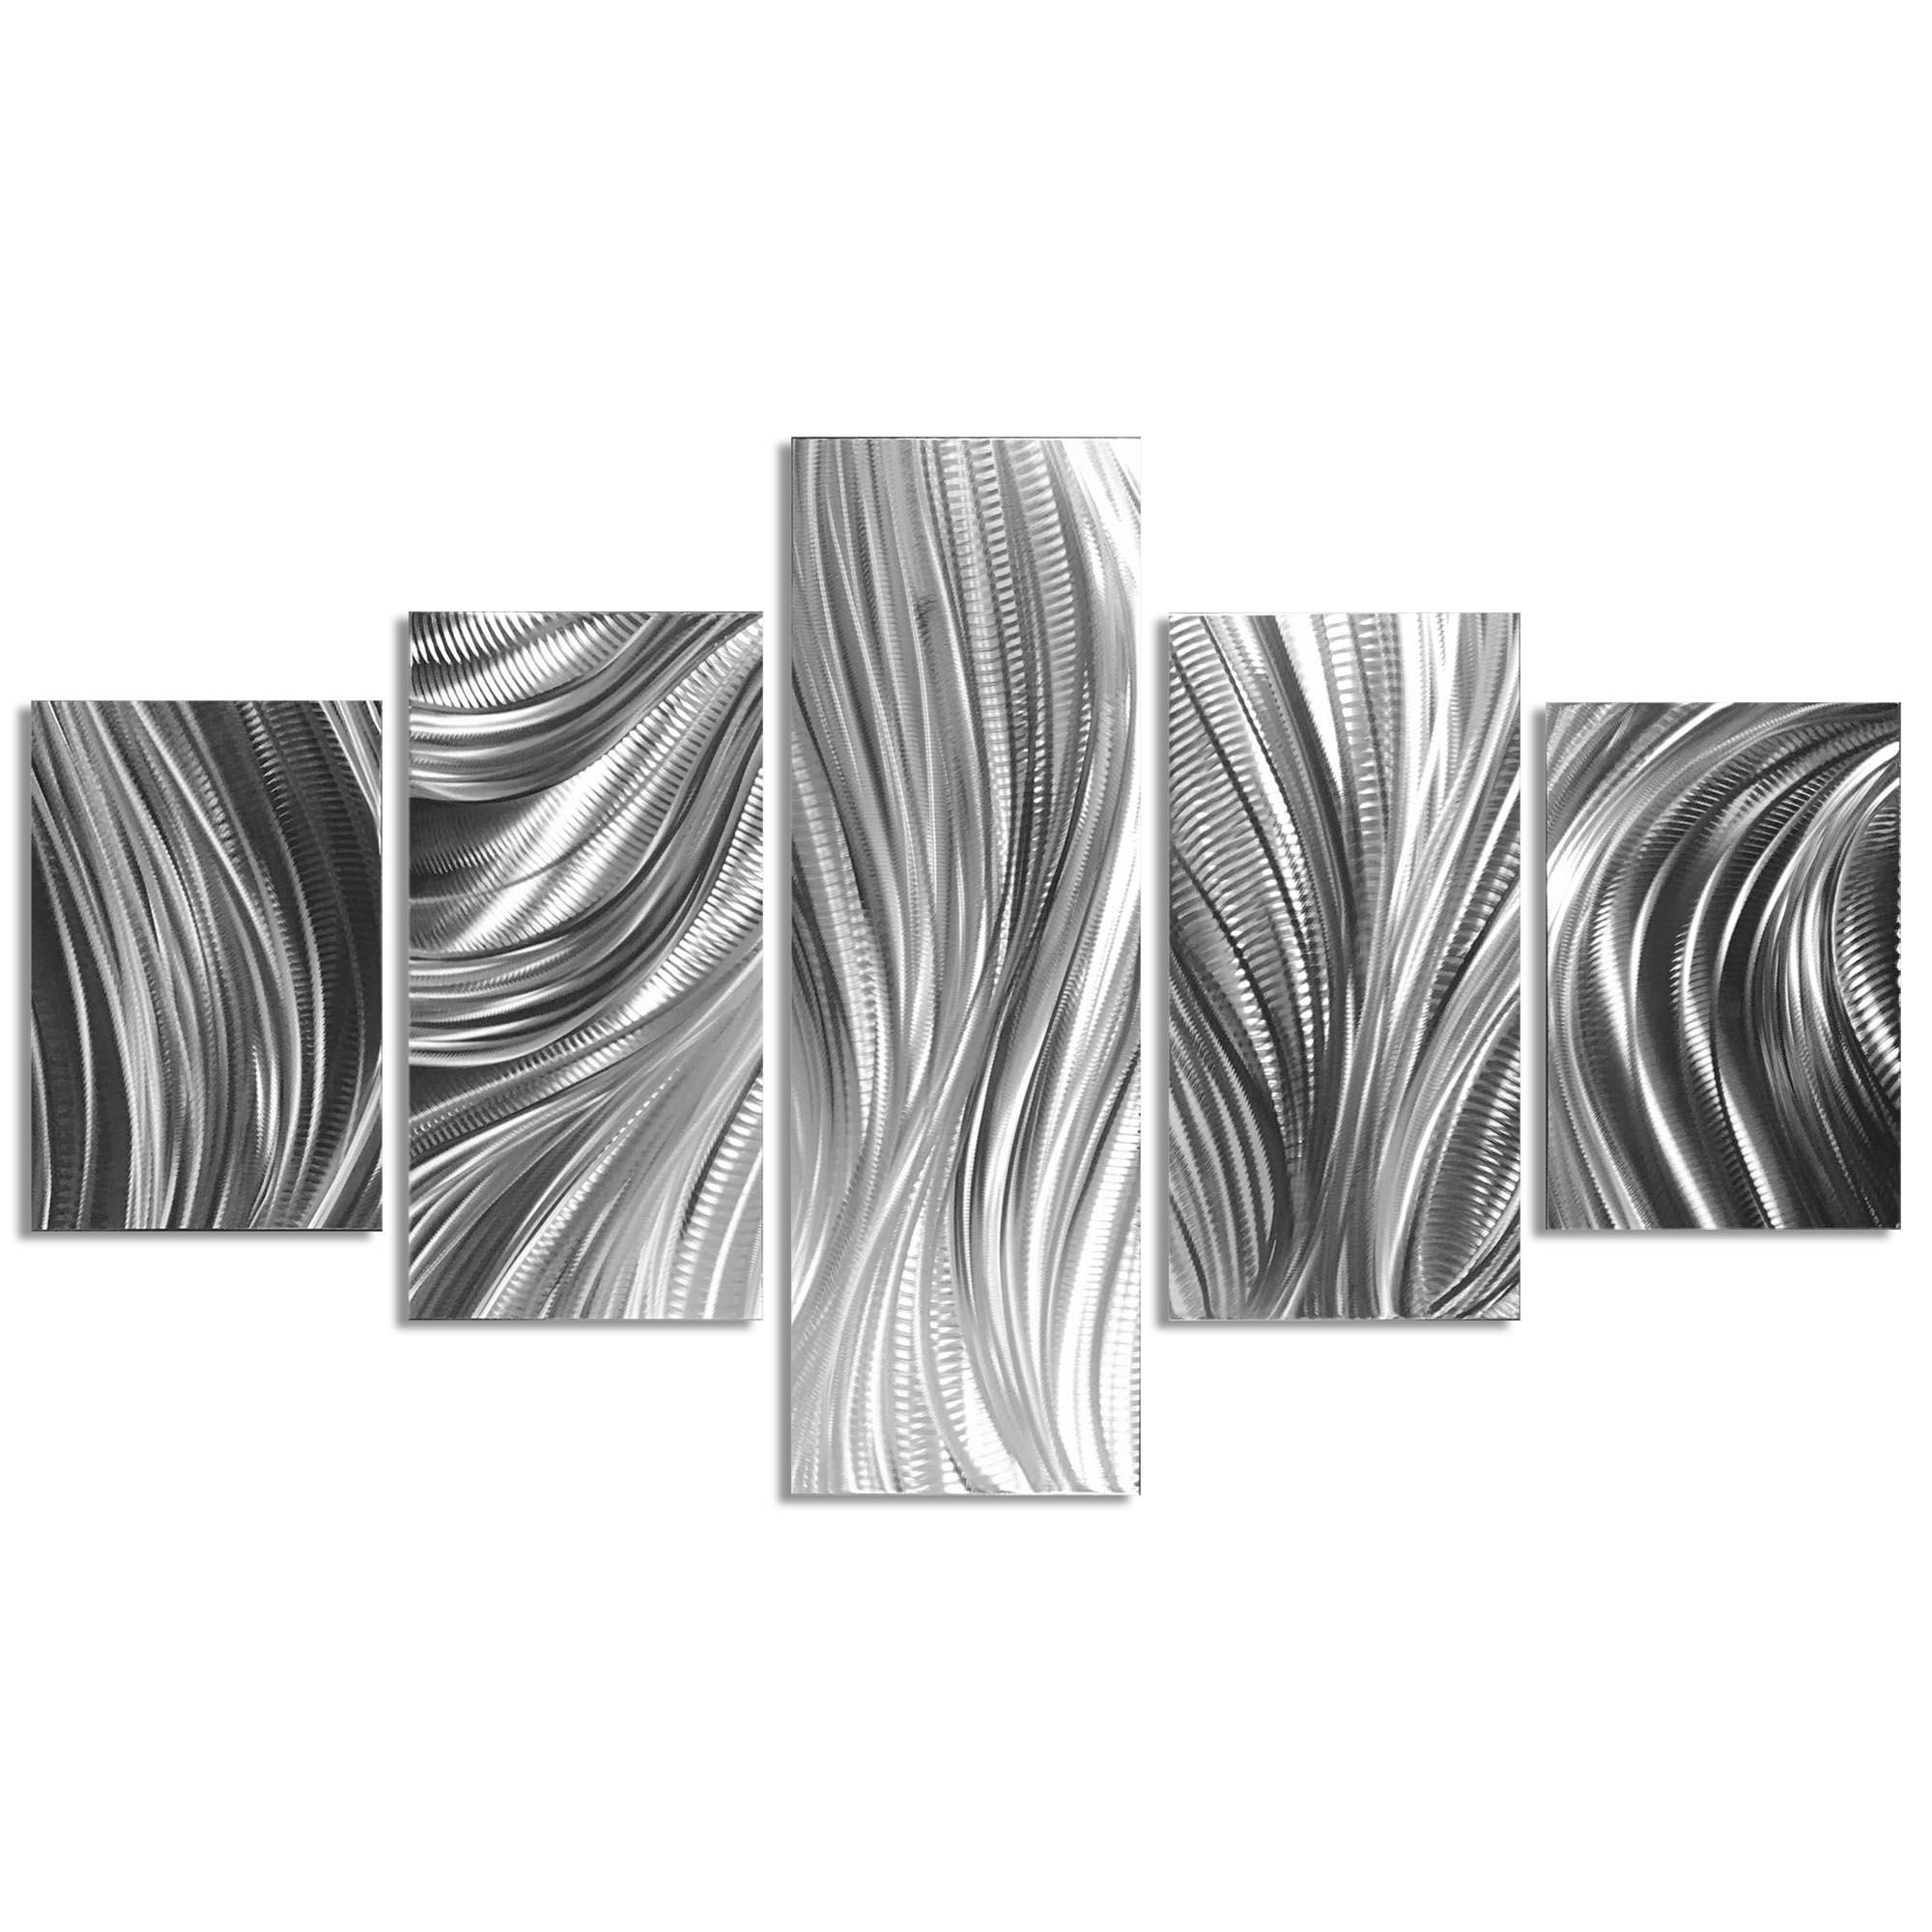 Columnar Plumage 64x36in. Natural Aluminum Abstract Decor